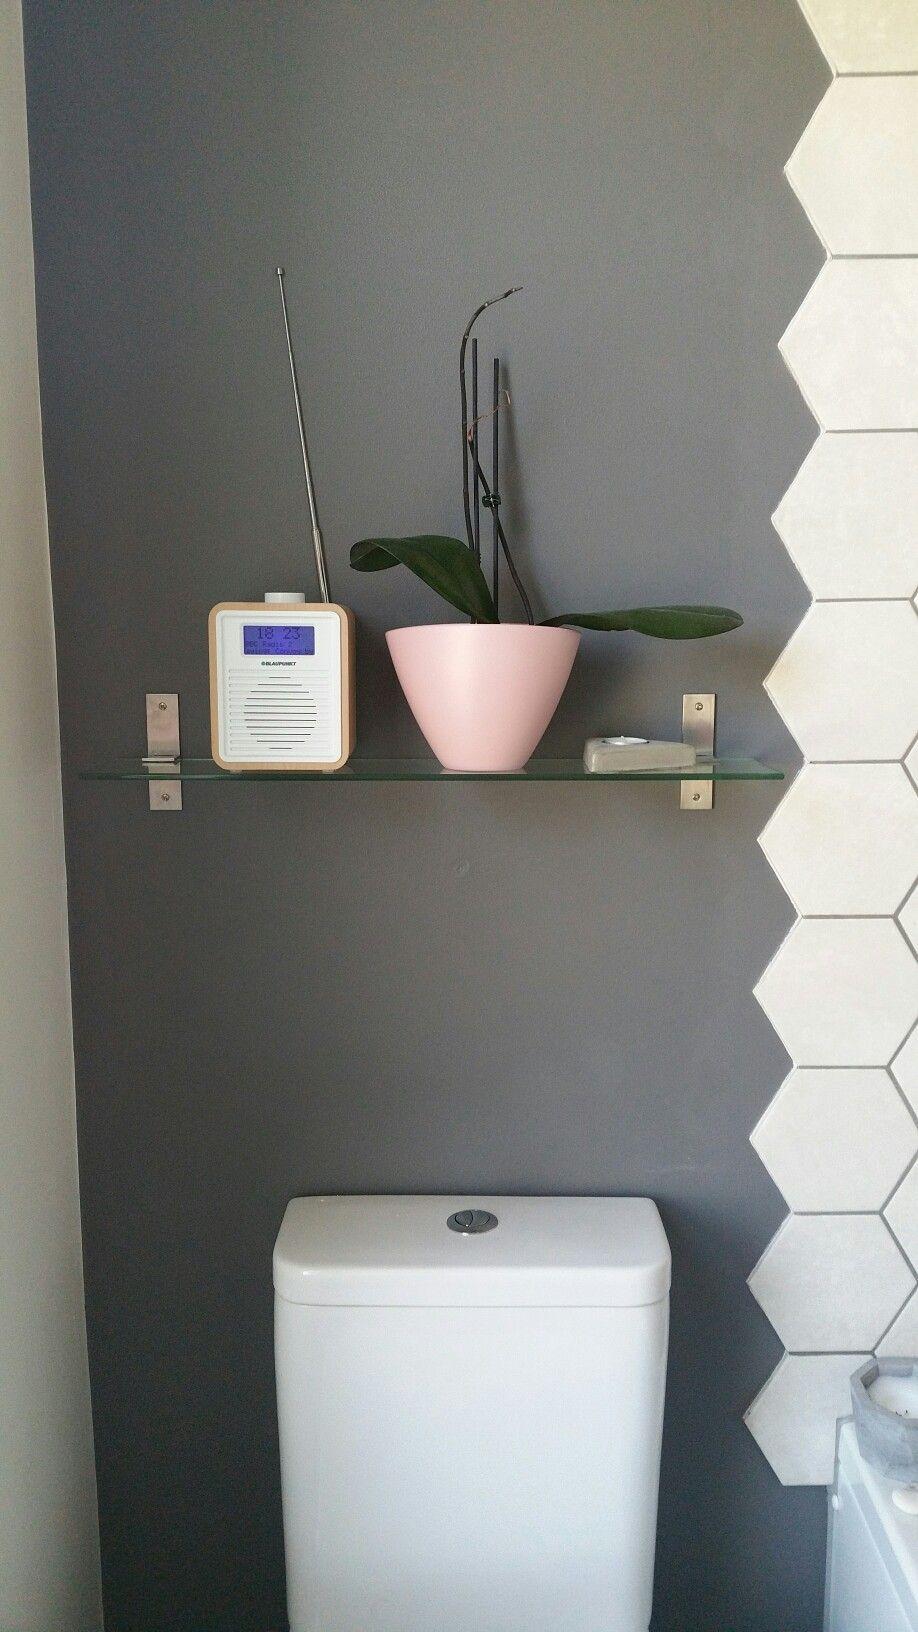 Bathroom Space Saver Over Toilet Ikea Awesome Smart Home